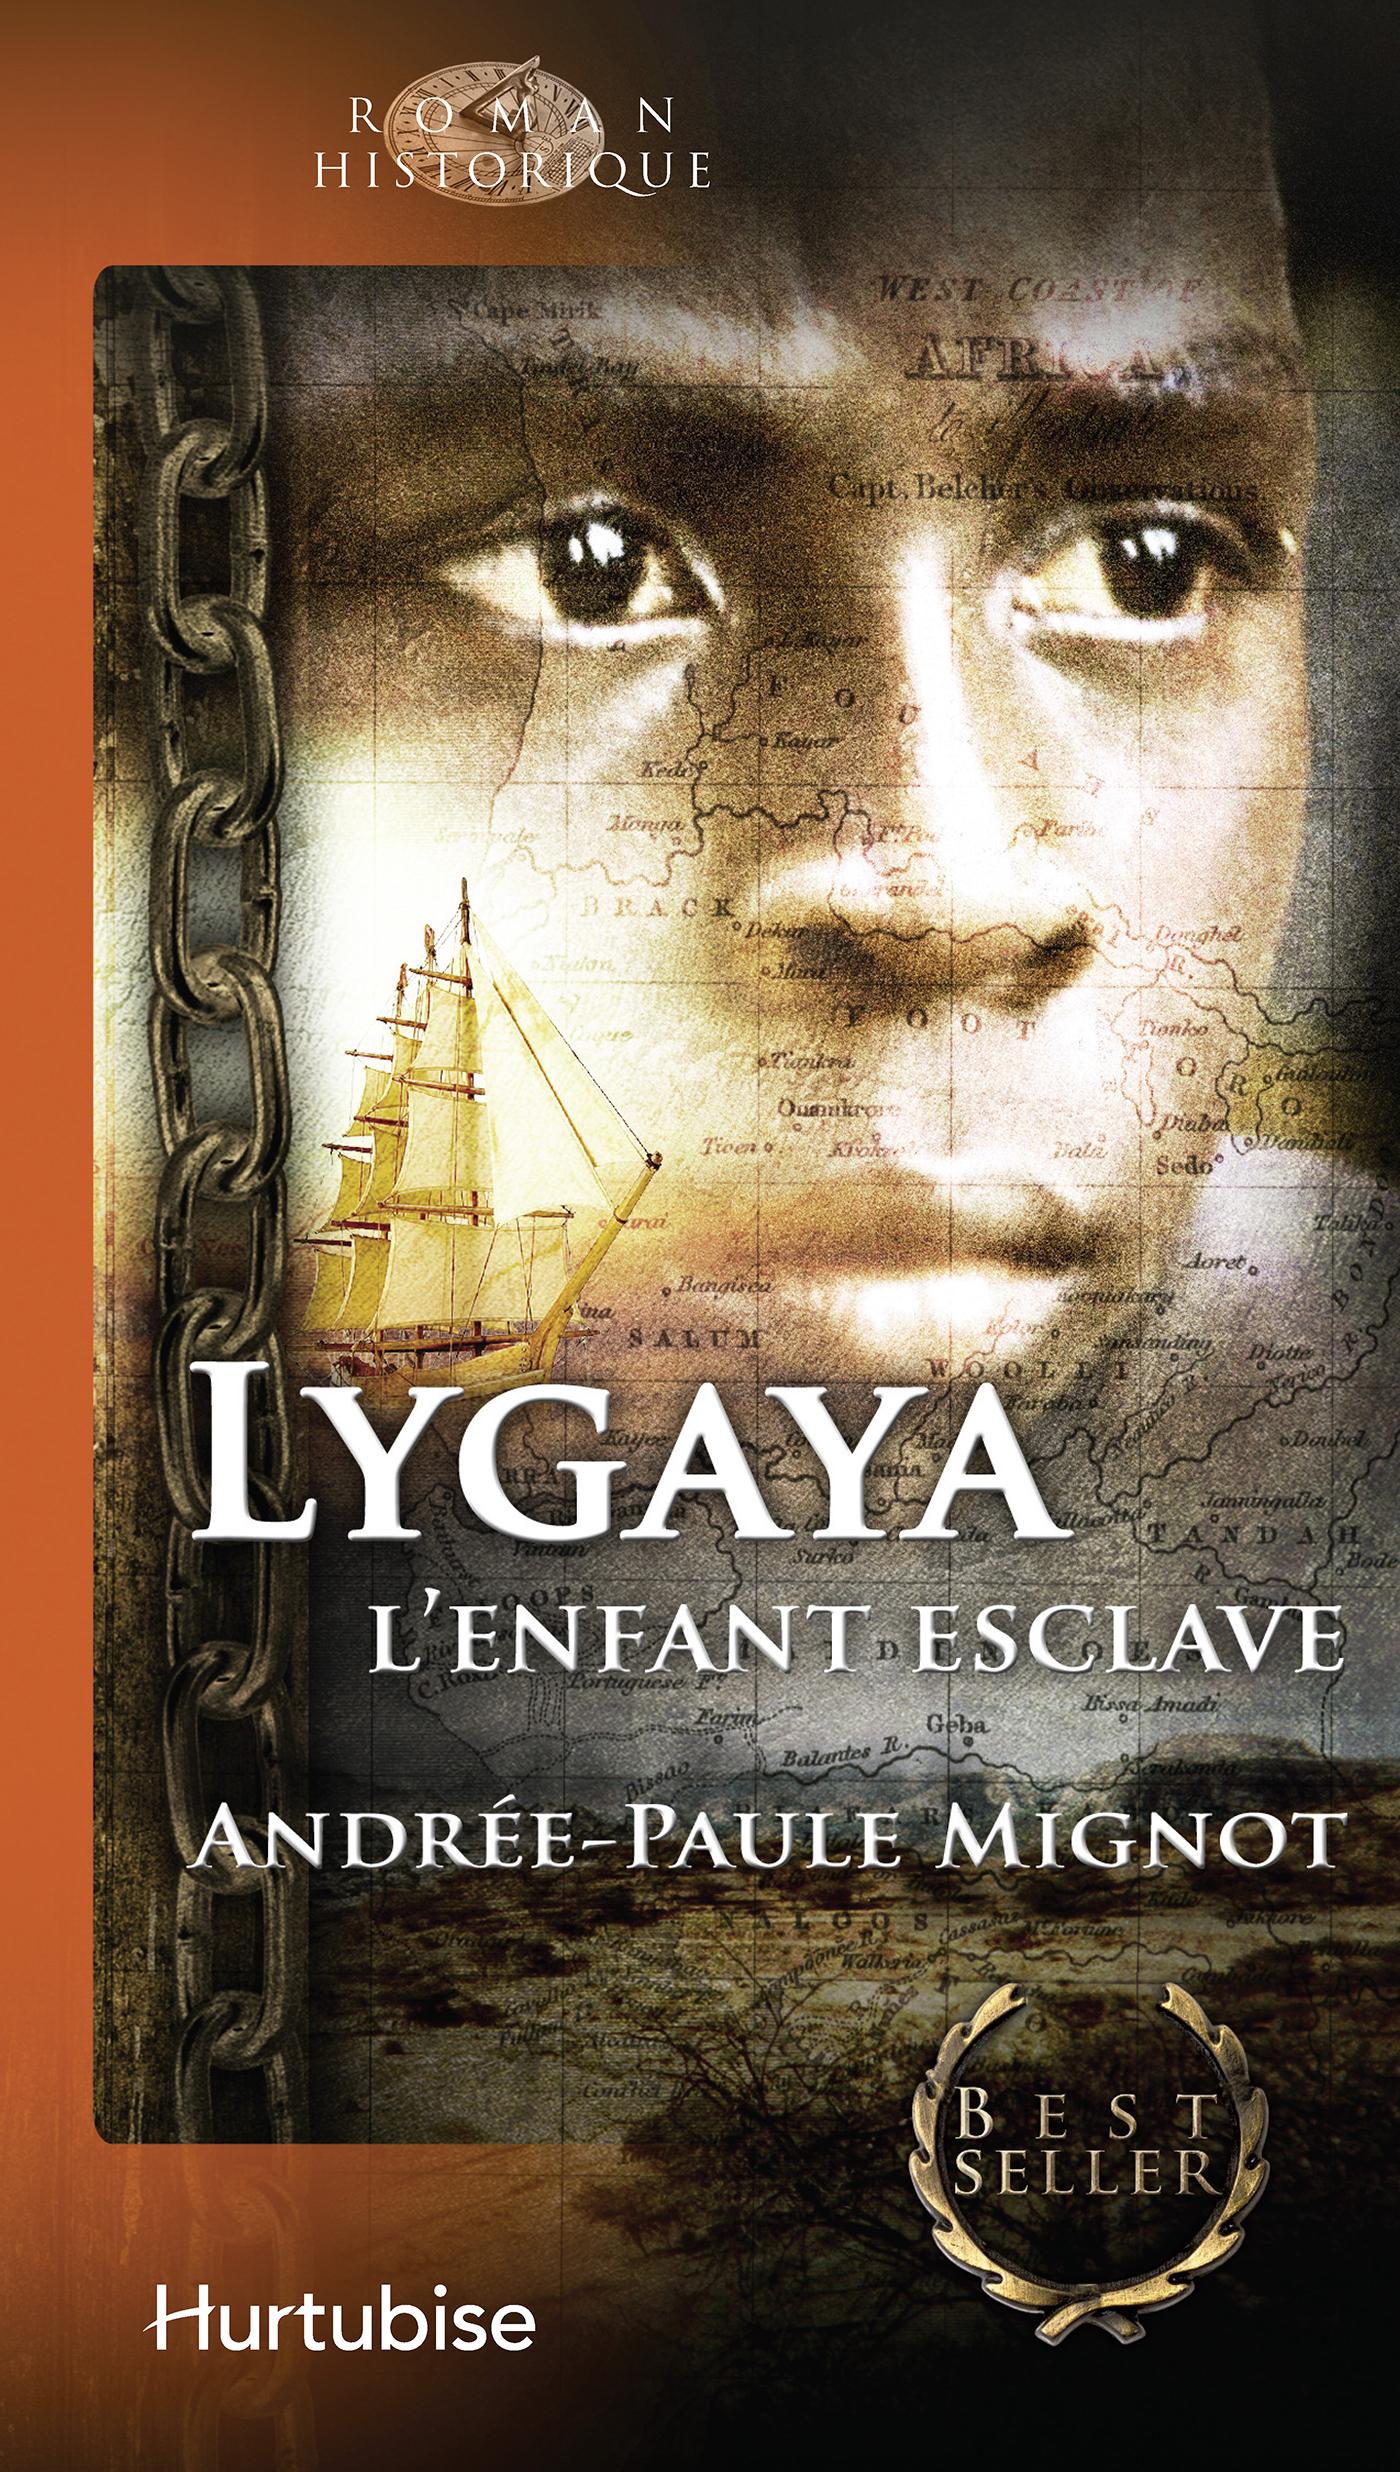 Lygaya, l'enfant esclave